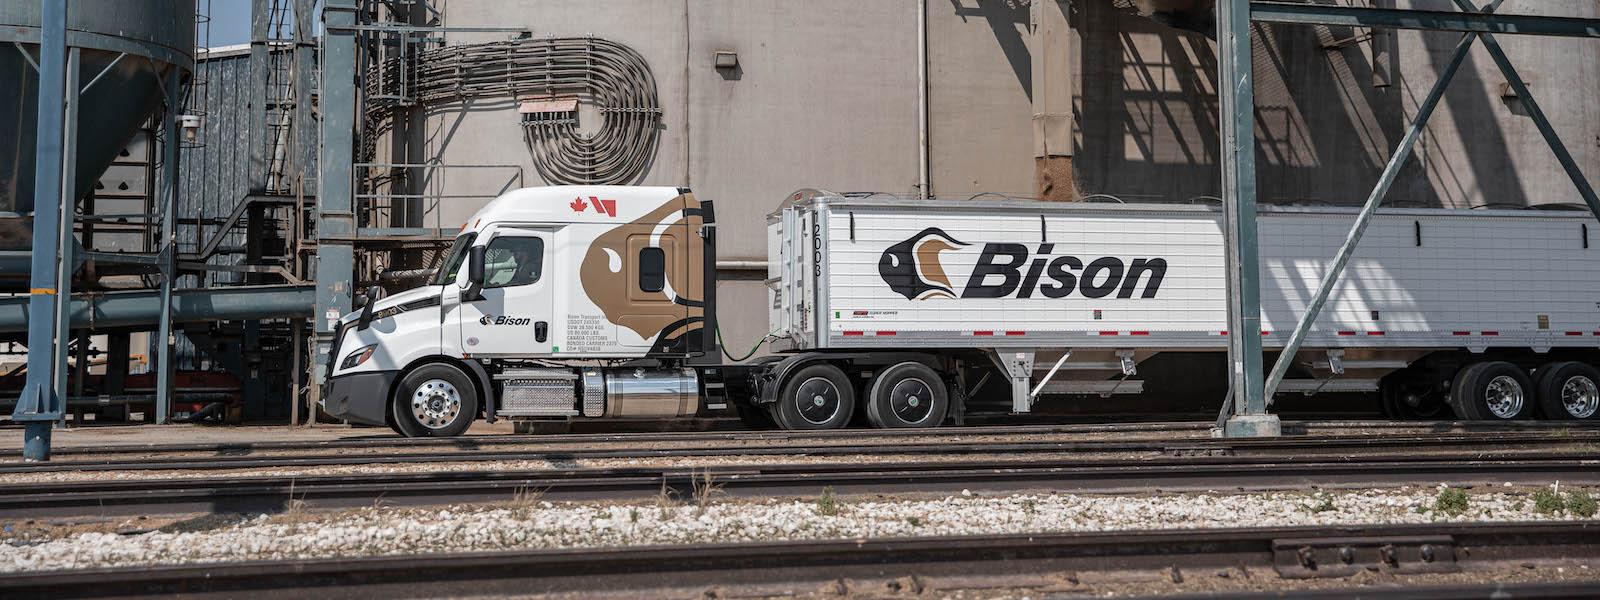 Key Industry: Transportation & Distribution